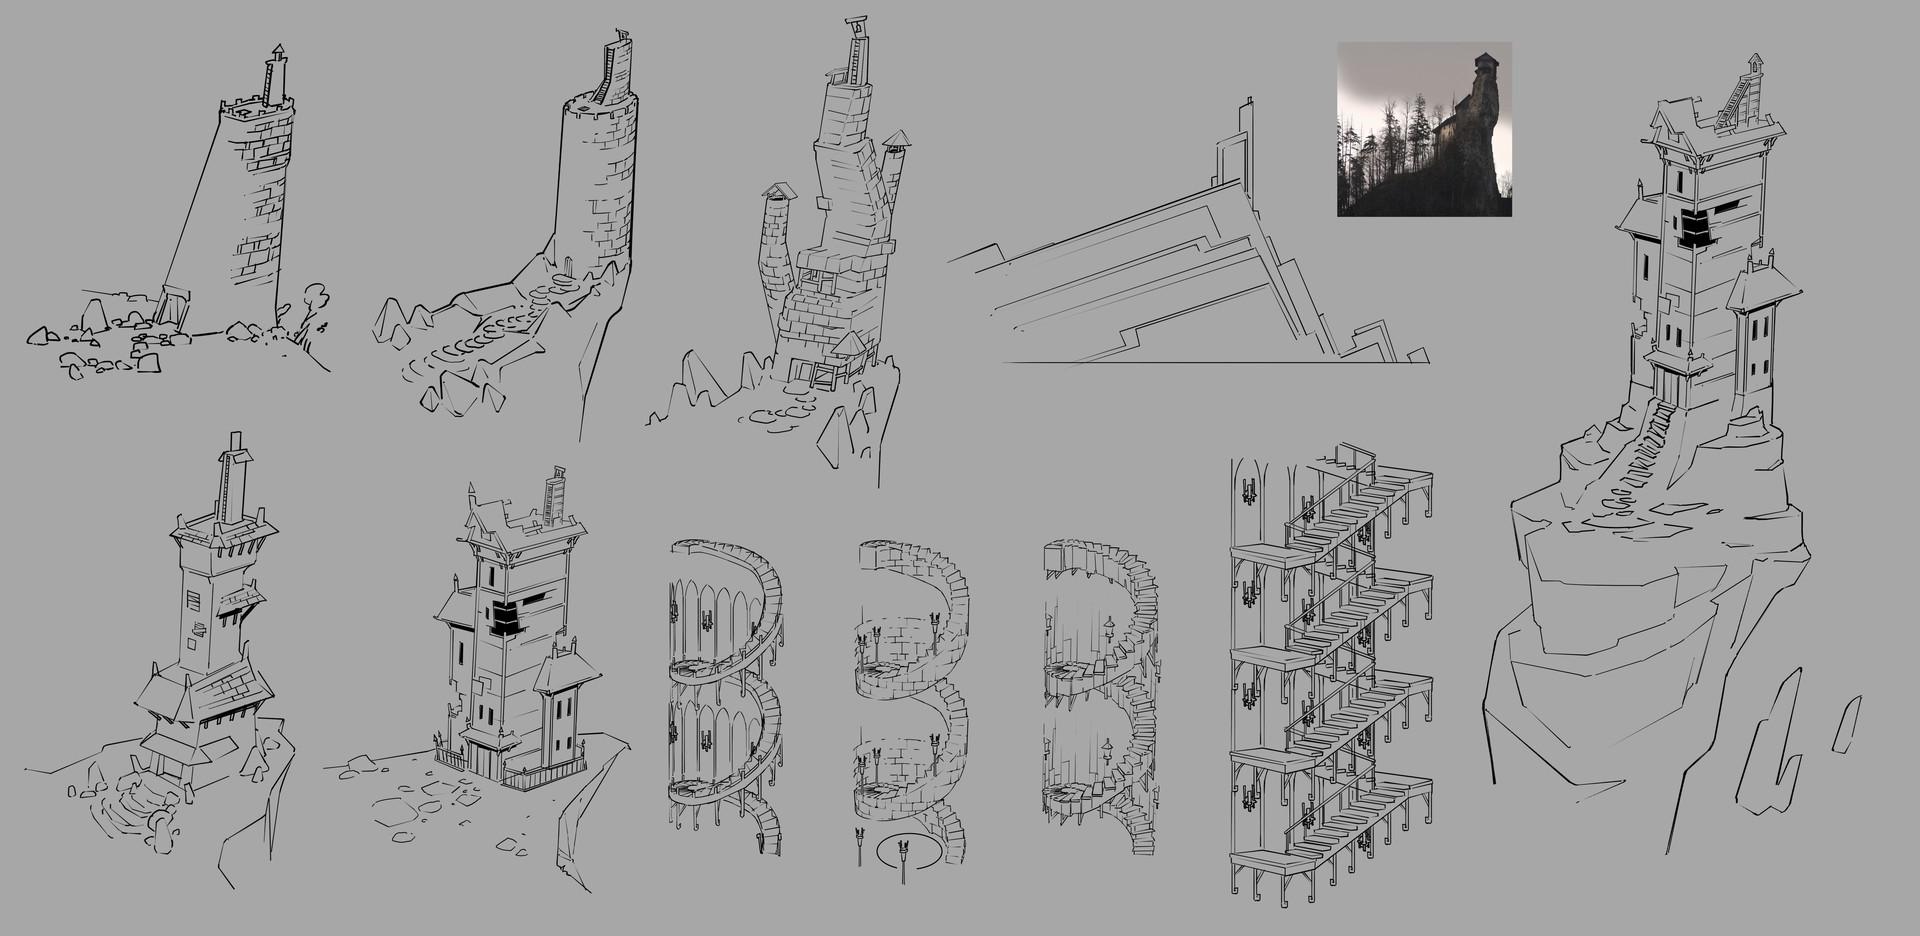 Arthur loftis uk bg spooky tower v2 al